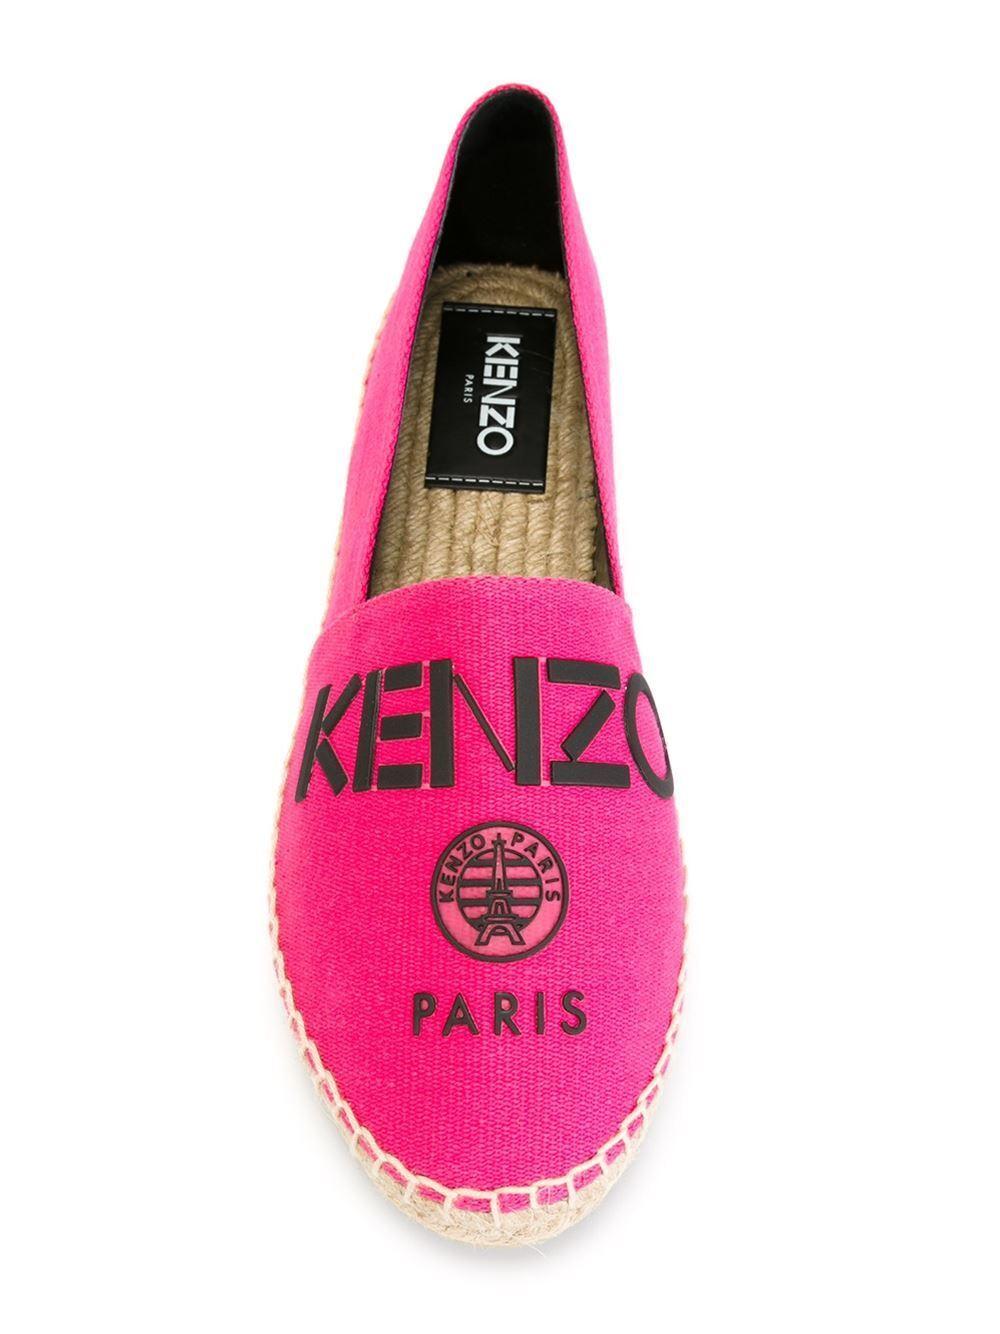 Kenzo Paris Pink New Espadrilles Schuhes, Größe EU37/UK4 - New Pink with box d21e89